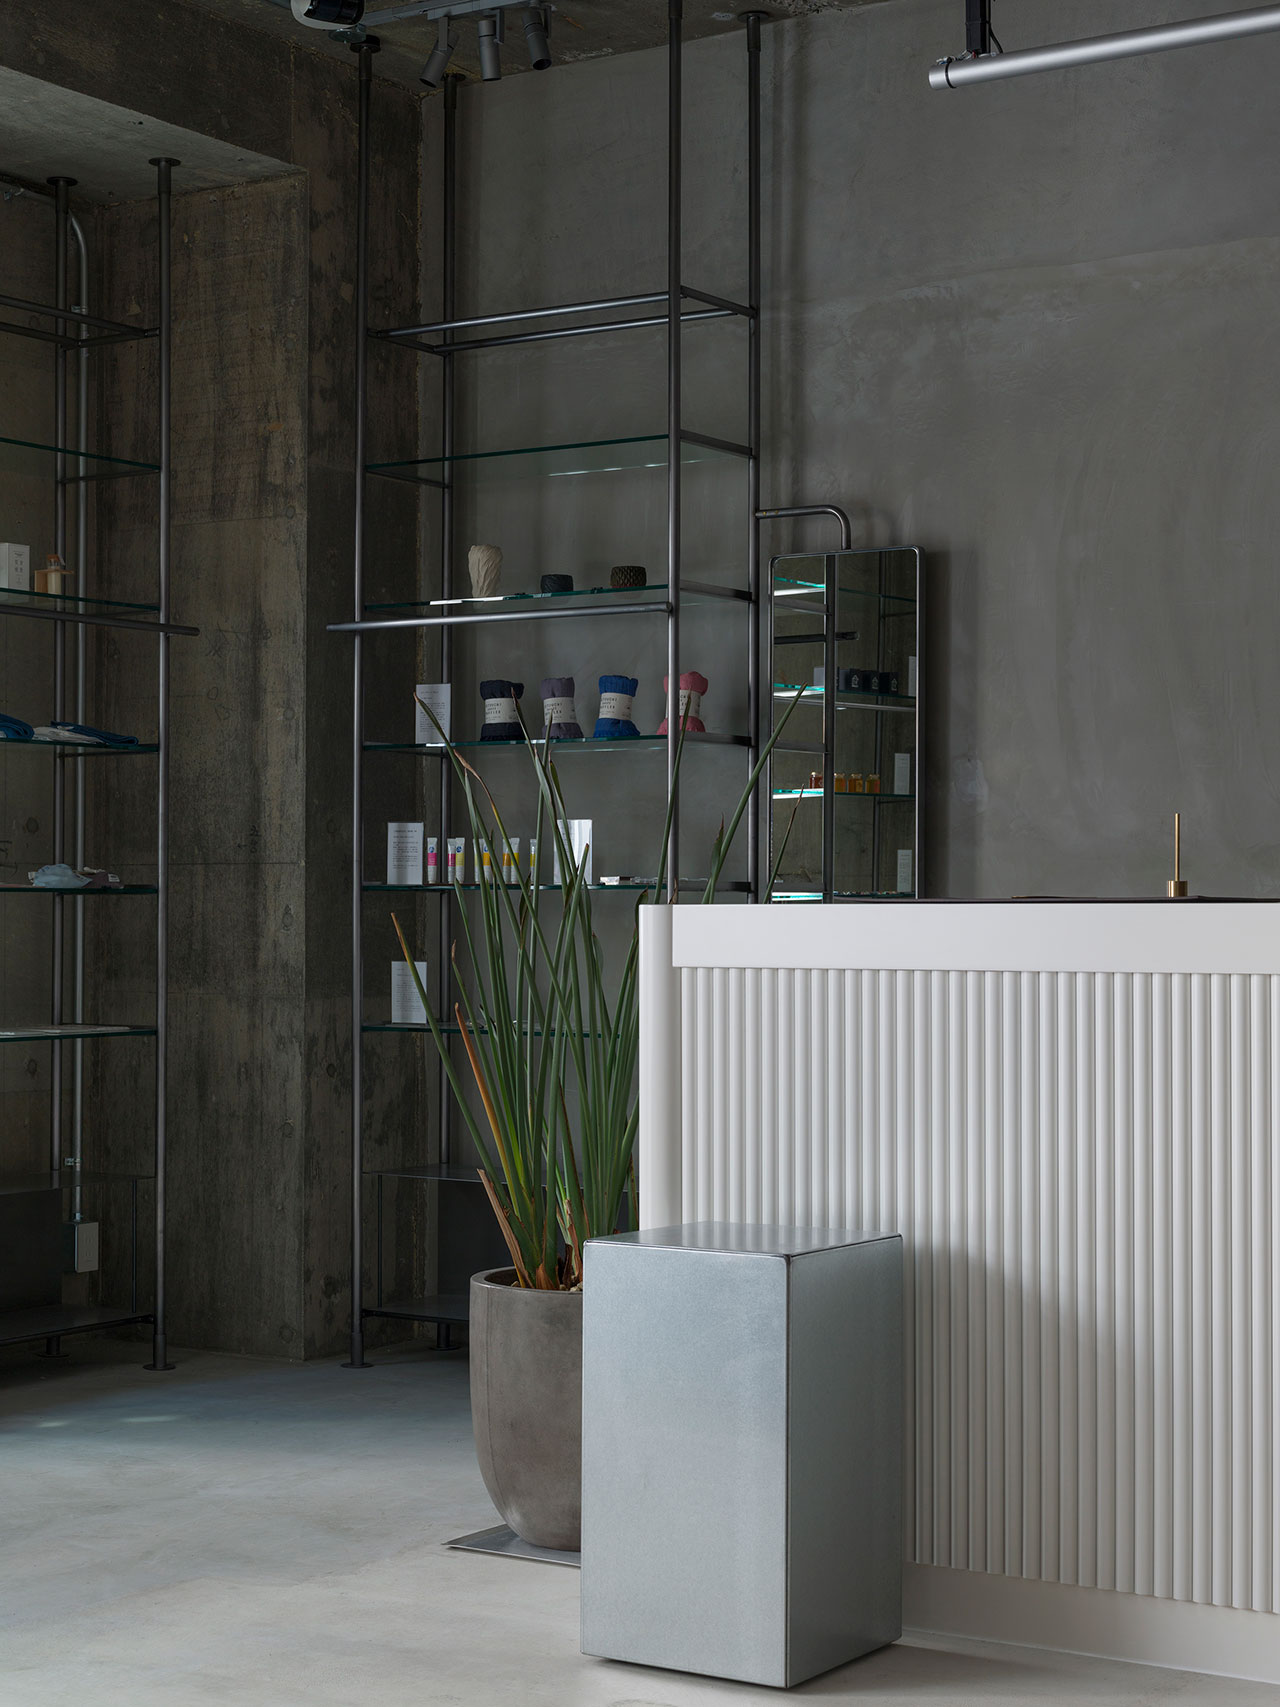 KIRO HIROSHIMA by THE SHARE HOTELS. Interior design by Hiroyuki Tanaka Architects. Photography by Gottingham.